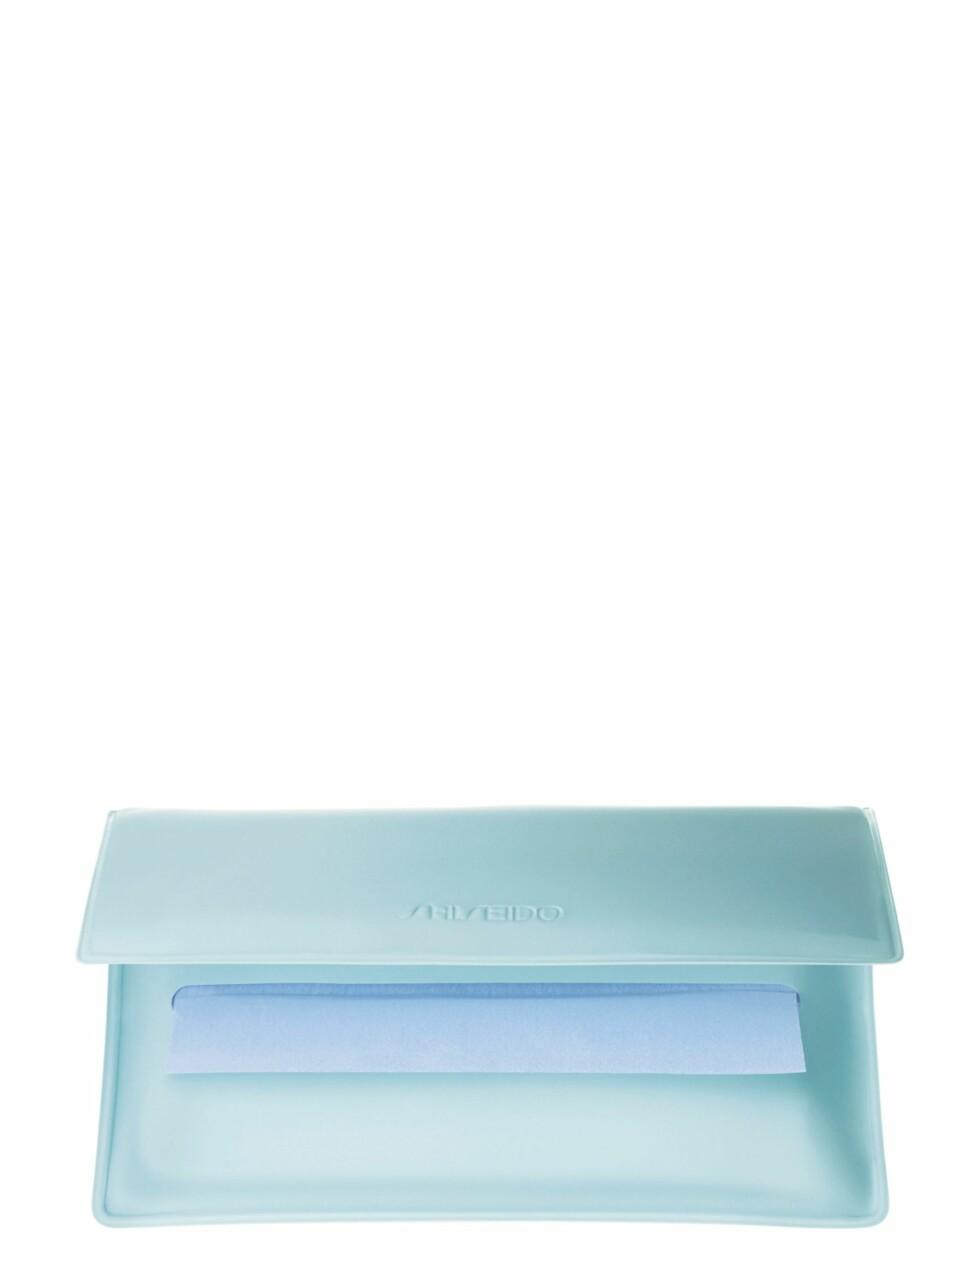 Blotting paper fra Shiseido |225,-| https://www.boozt.com/no/no/shiseido/shi-spn-oil-control-blotting-paper-100-pcs_15796533/15796537?utm_source=google&utm_medium=feed&utm_content=no&utm_campaign=productsearch&gclid=EAIaIQobChMImIbKv9vV2wIVlkMYCh1_zwLAEAQYASABEgKiKPD_BwE